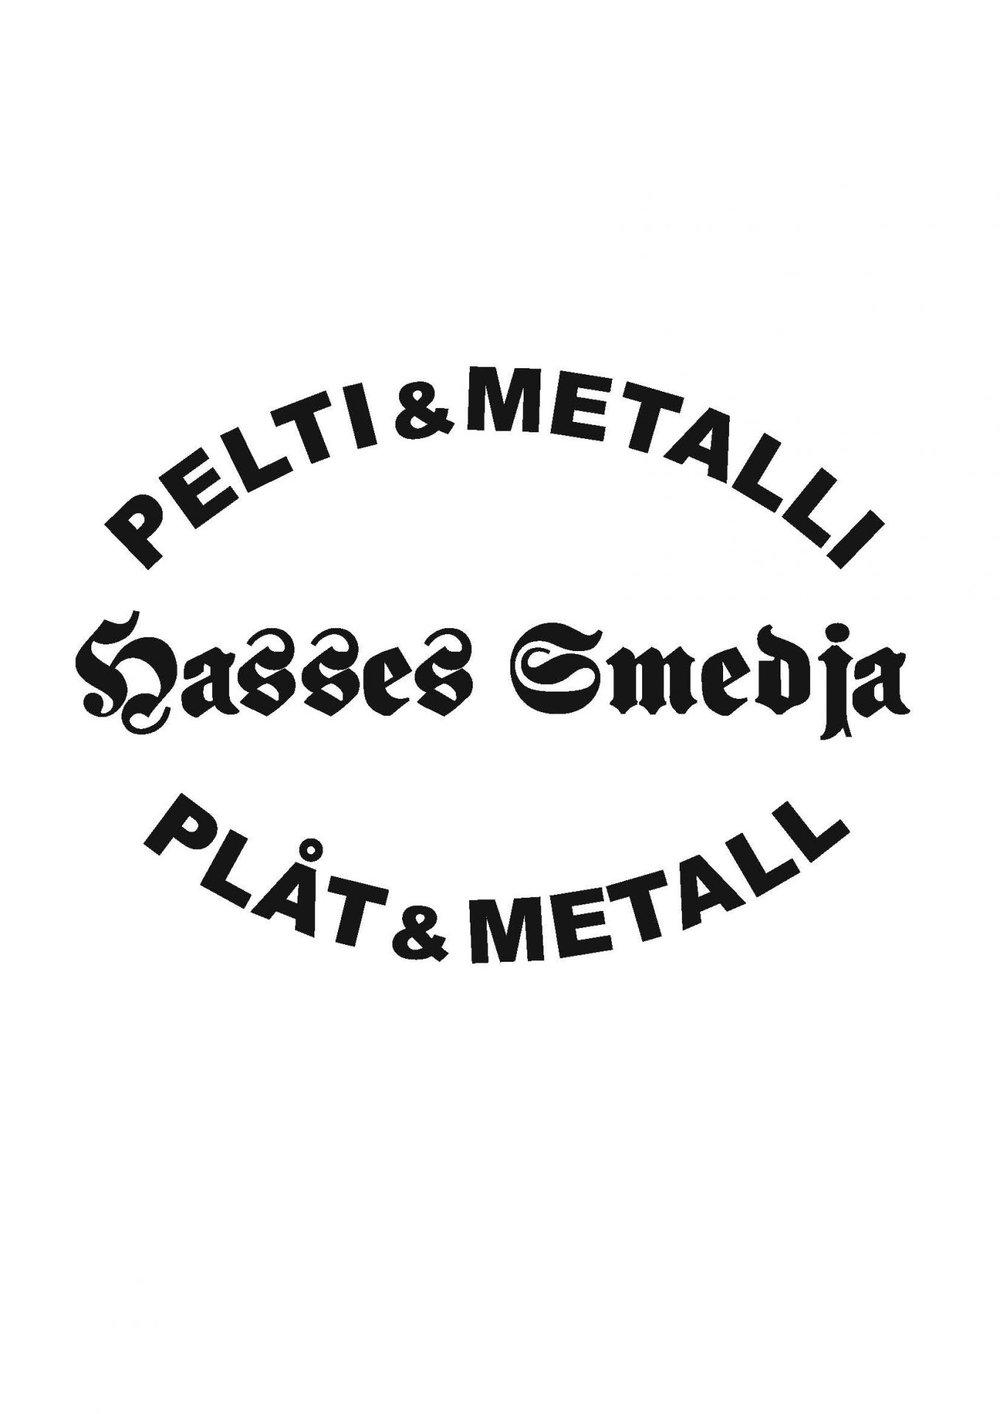 Hasses Smedja plat&metall logo.jpg